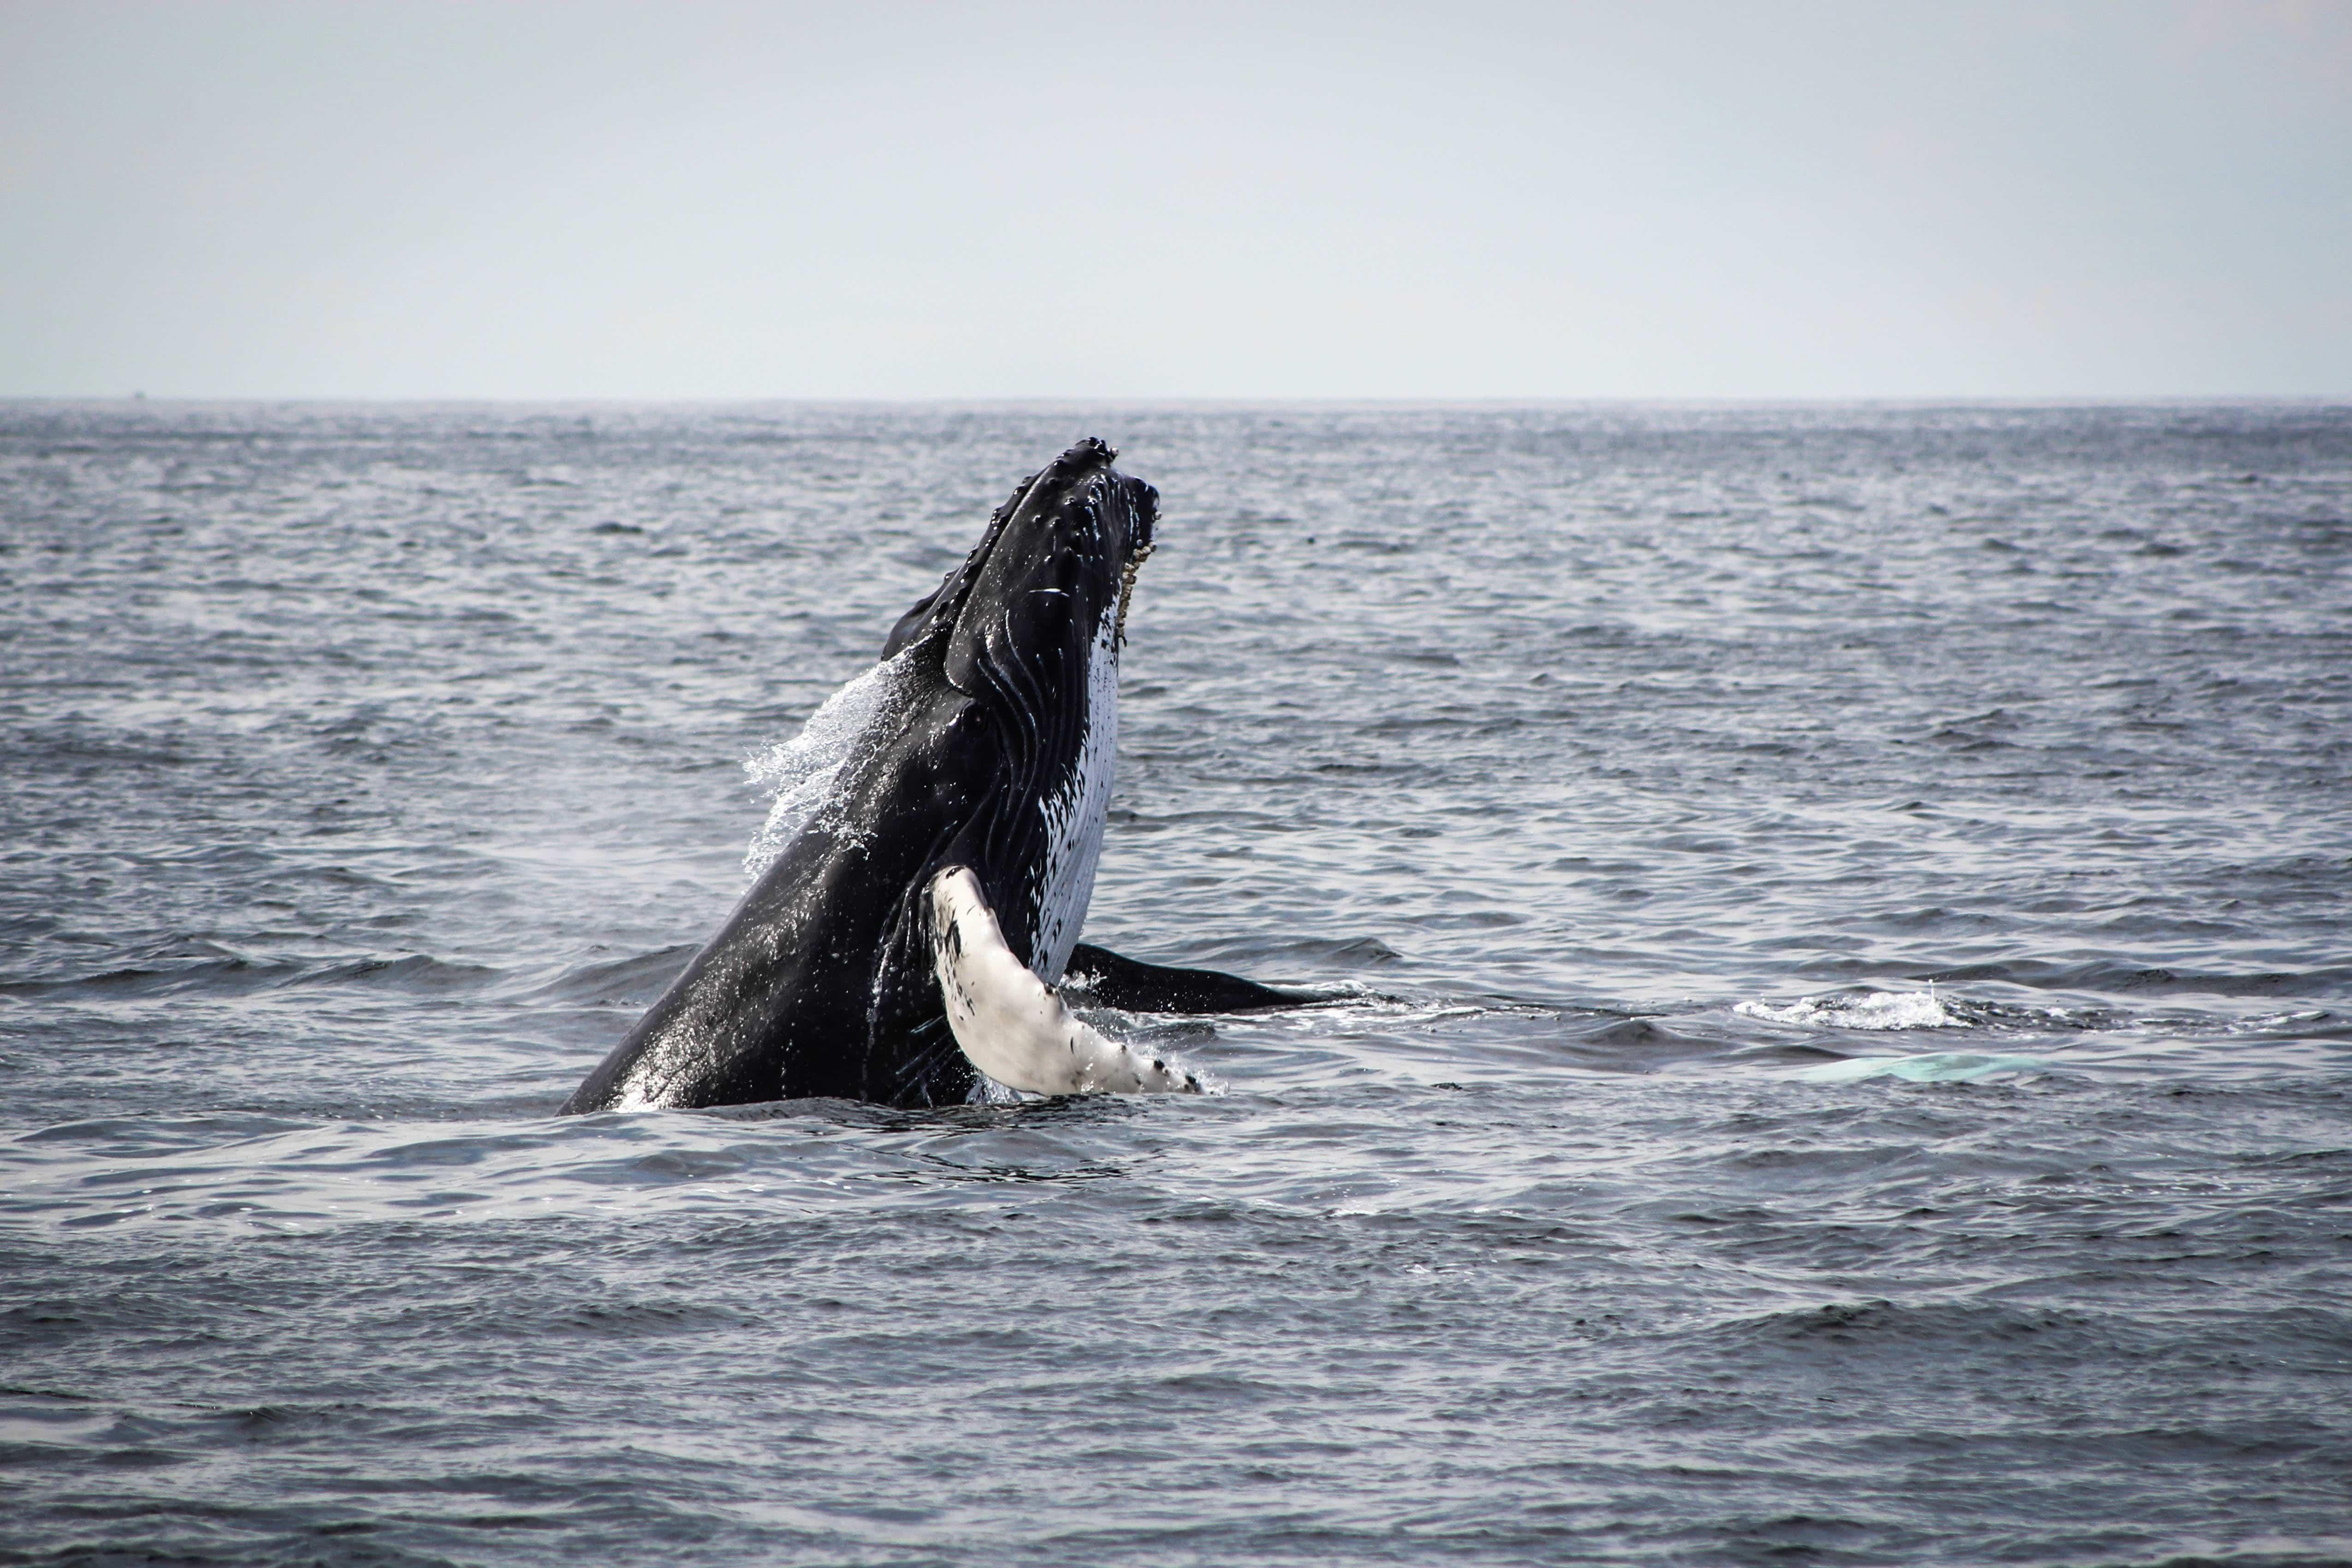 kaikoura, whale watch kaikoura, kaikoura whale watching, whale watching in kaikoura, kaikoura road, kaikoura whale watch, whale watching boat or plane?